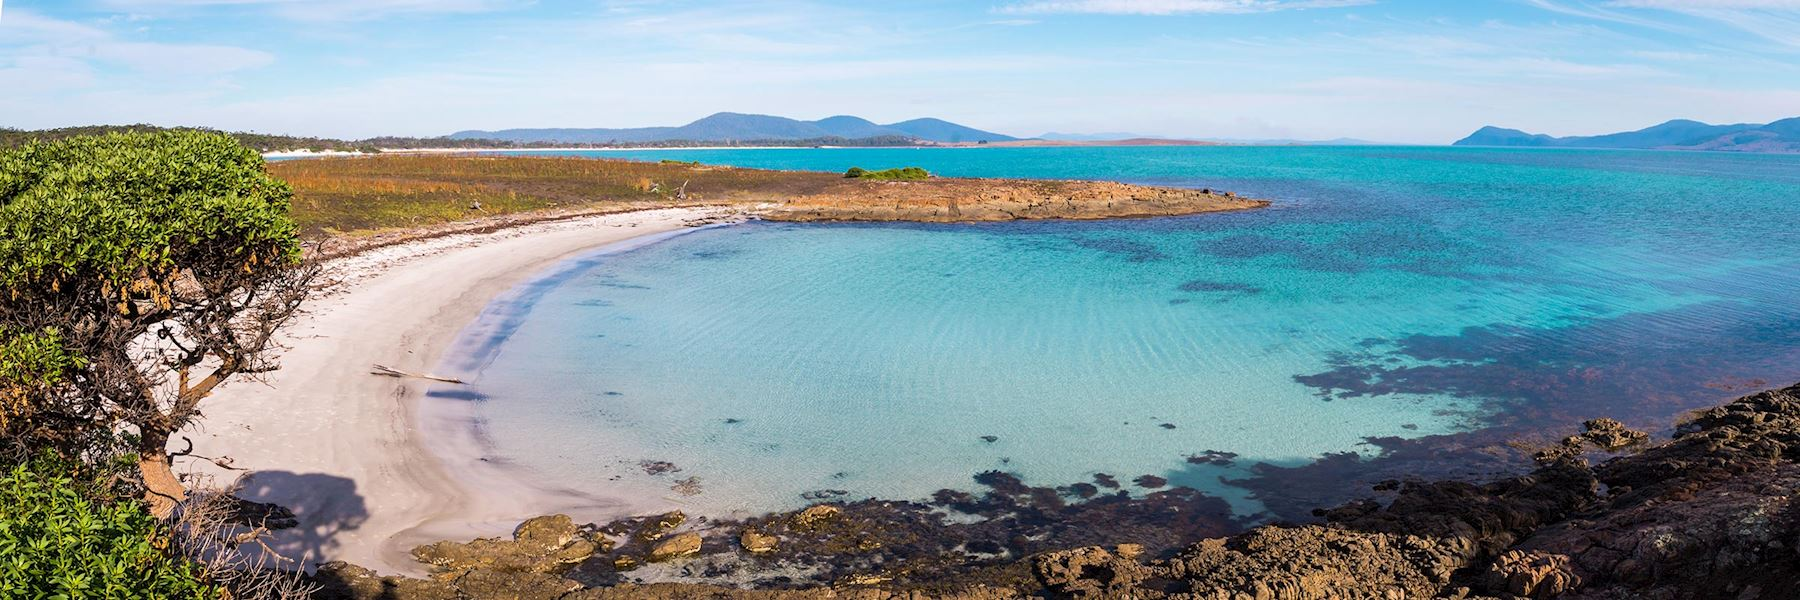 Visit Maria Island National Park, Australia